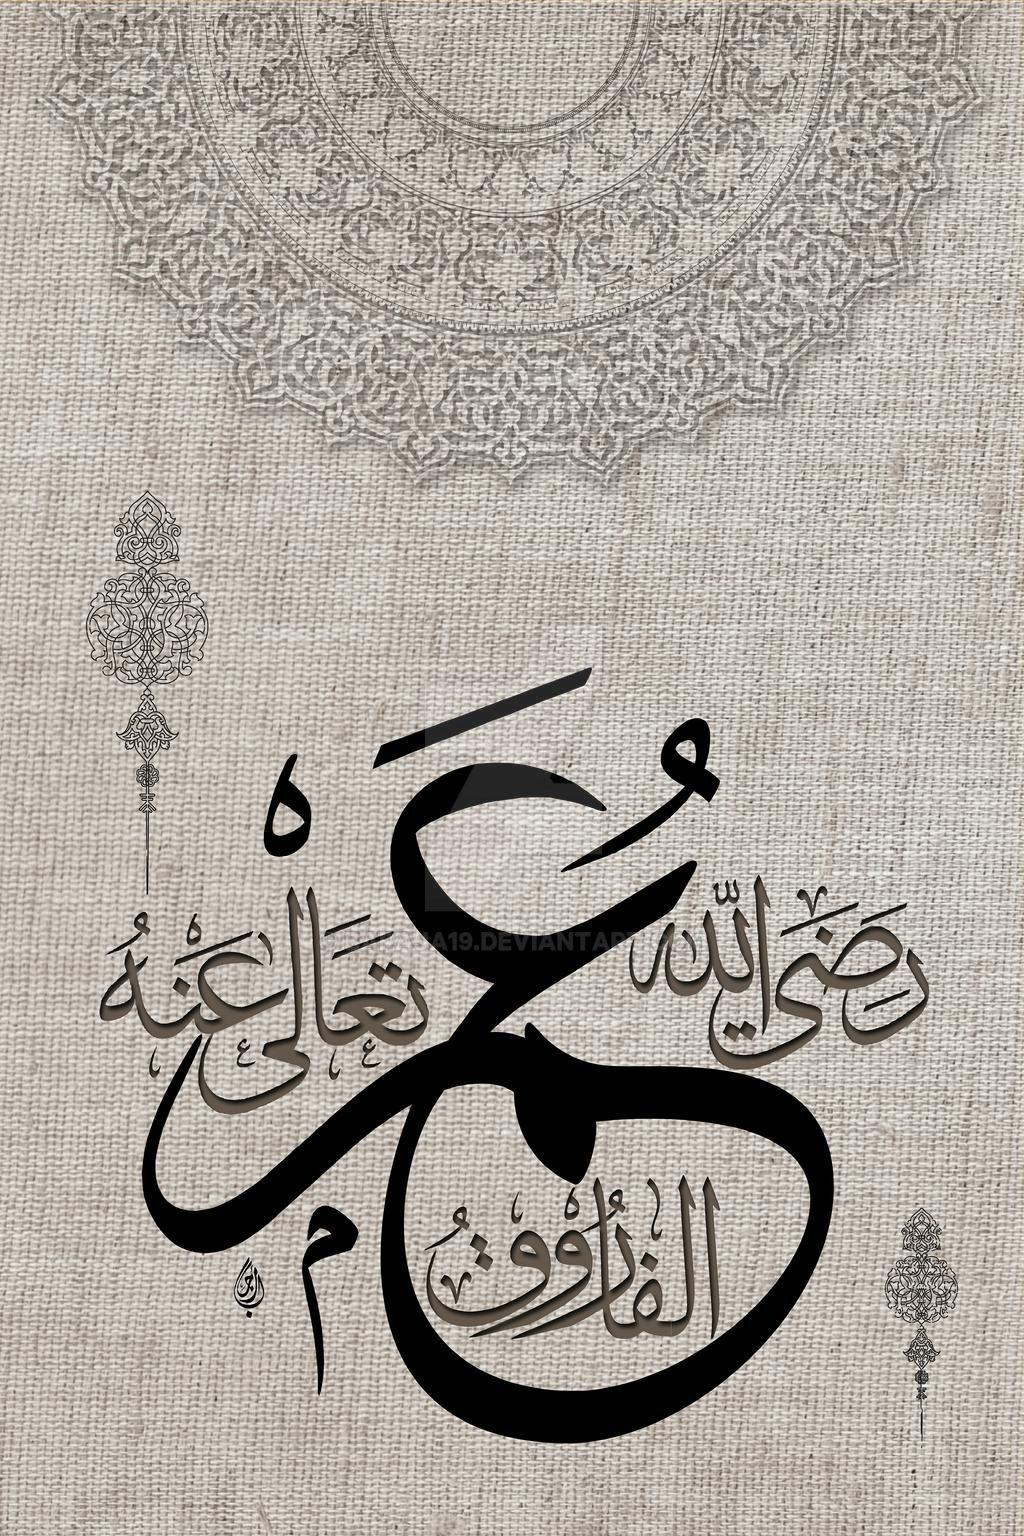 Omar Ibn Khattab R A By Baraja19 On Deviantart Islamic Art Calligraphy Islamic Calligraphy Painting Arabic Calligraphy Design